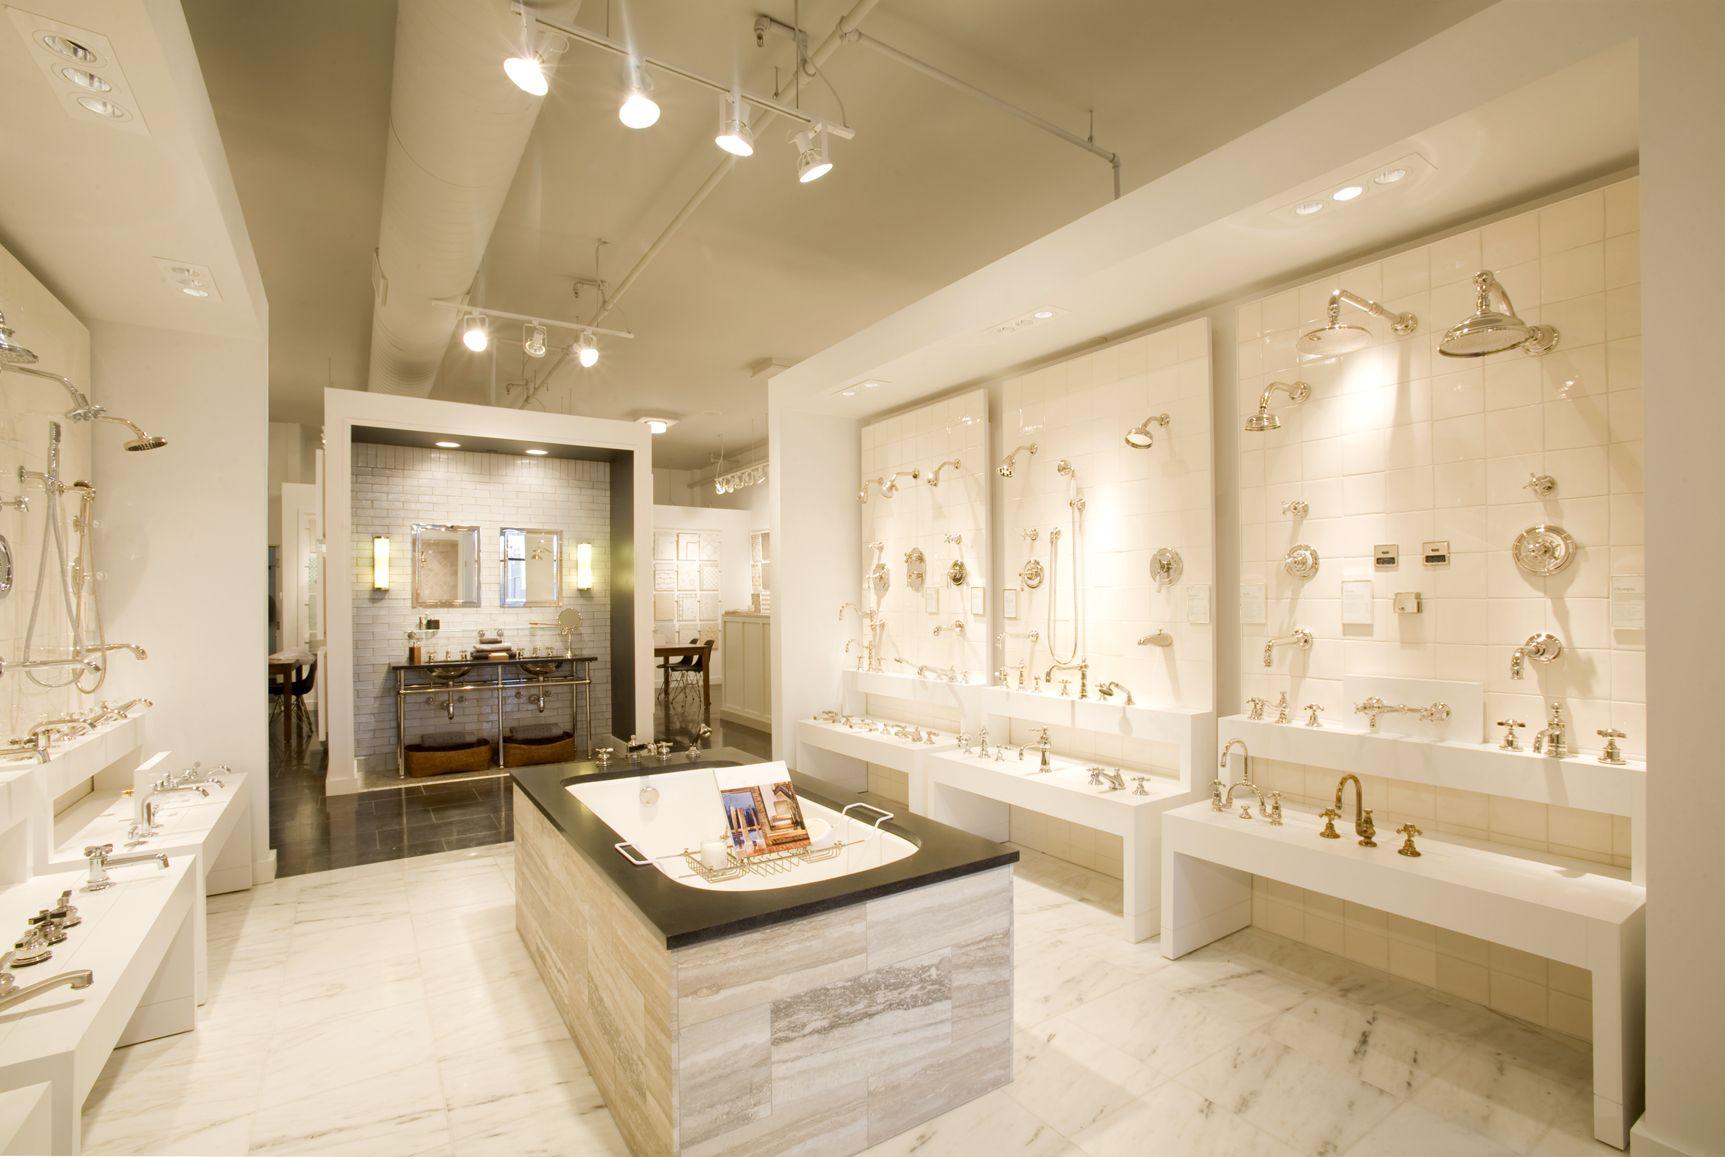 Waterworks Denver Showroom Showroom Interior Design Showroom